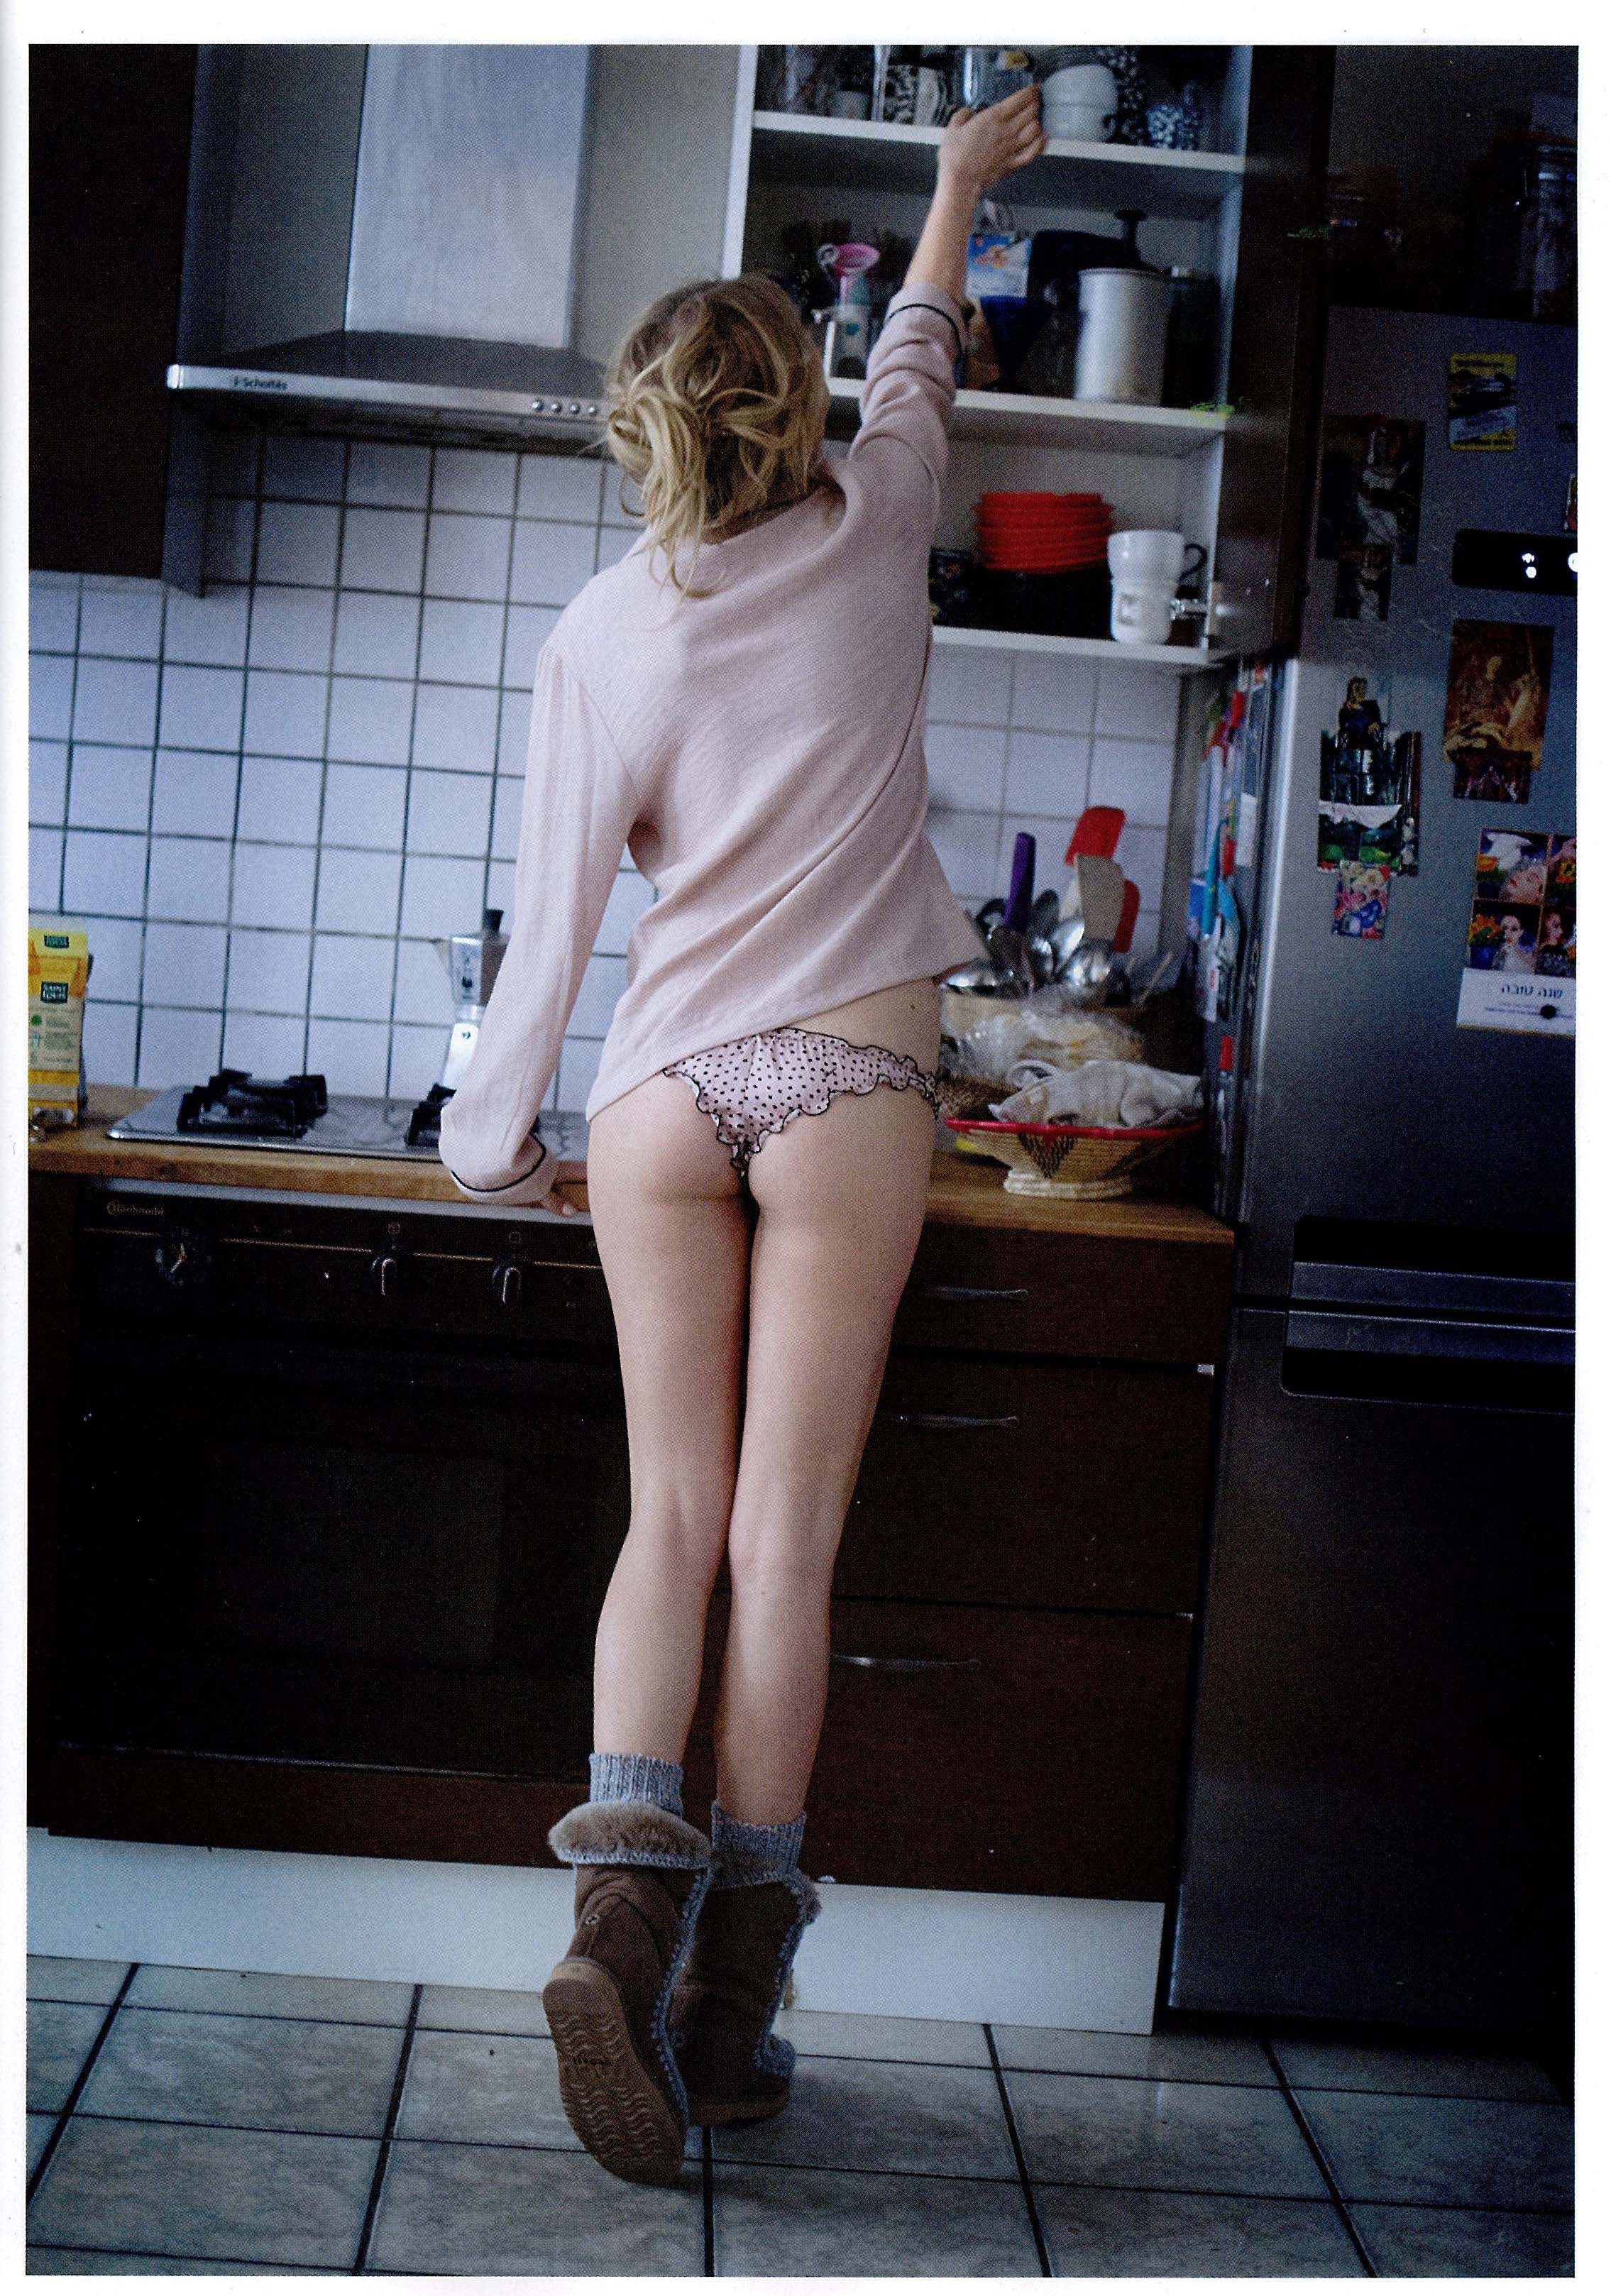 Public panties